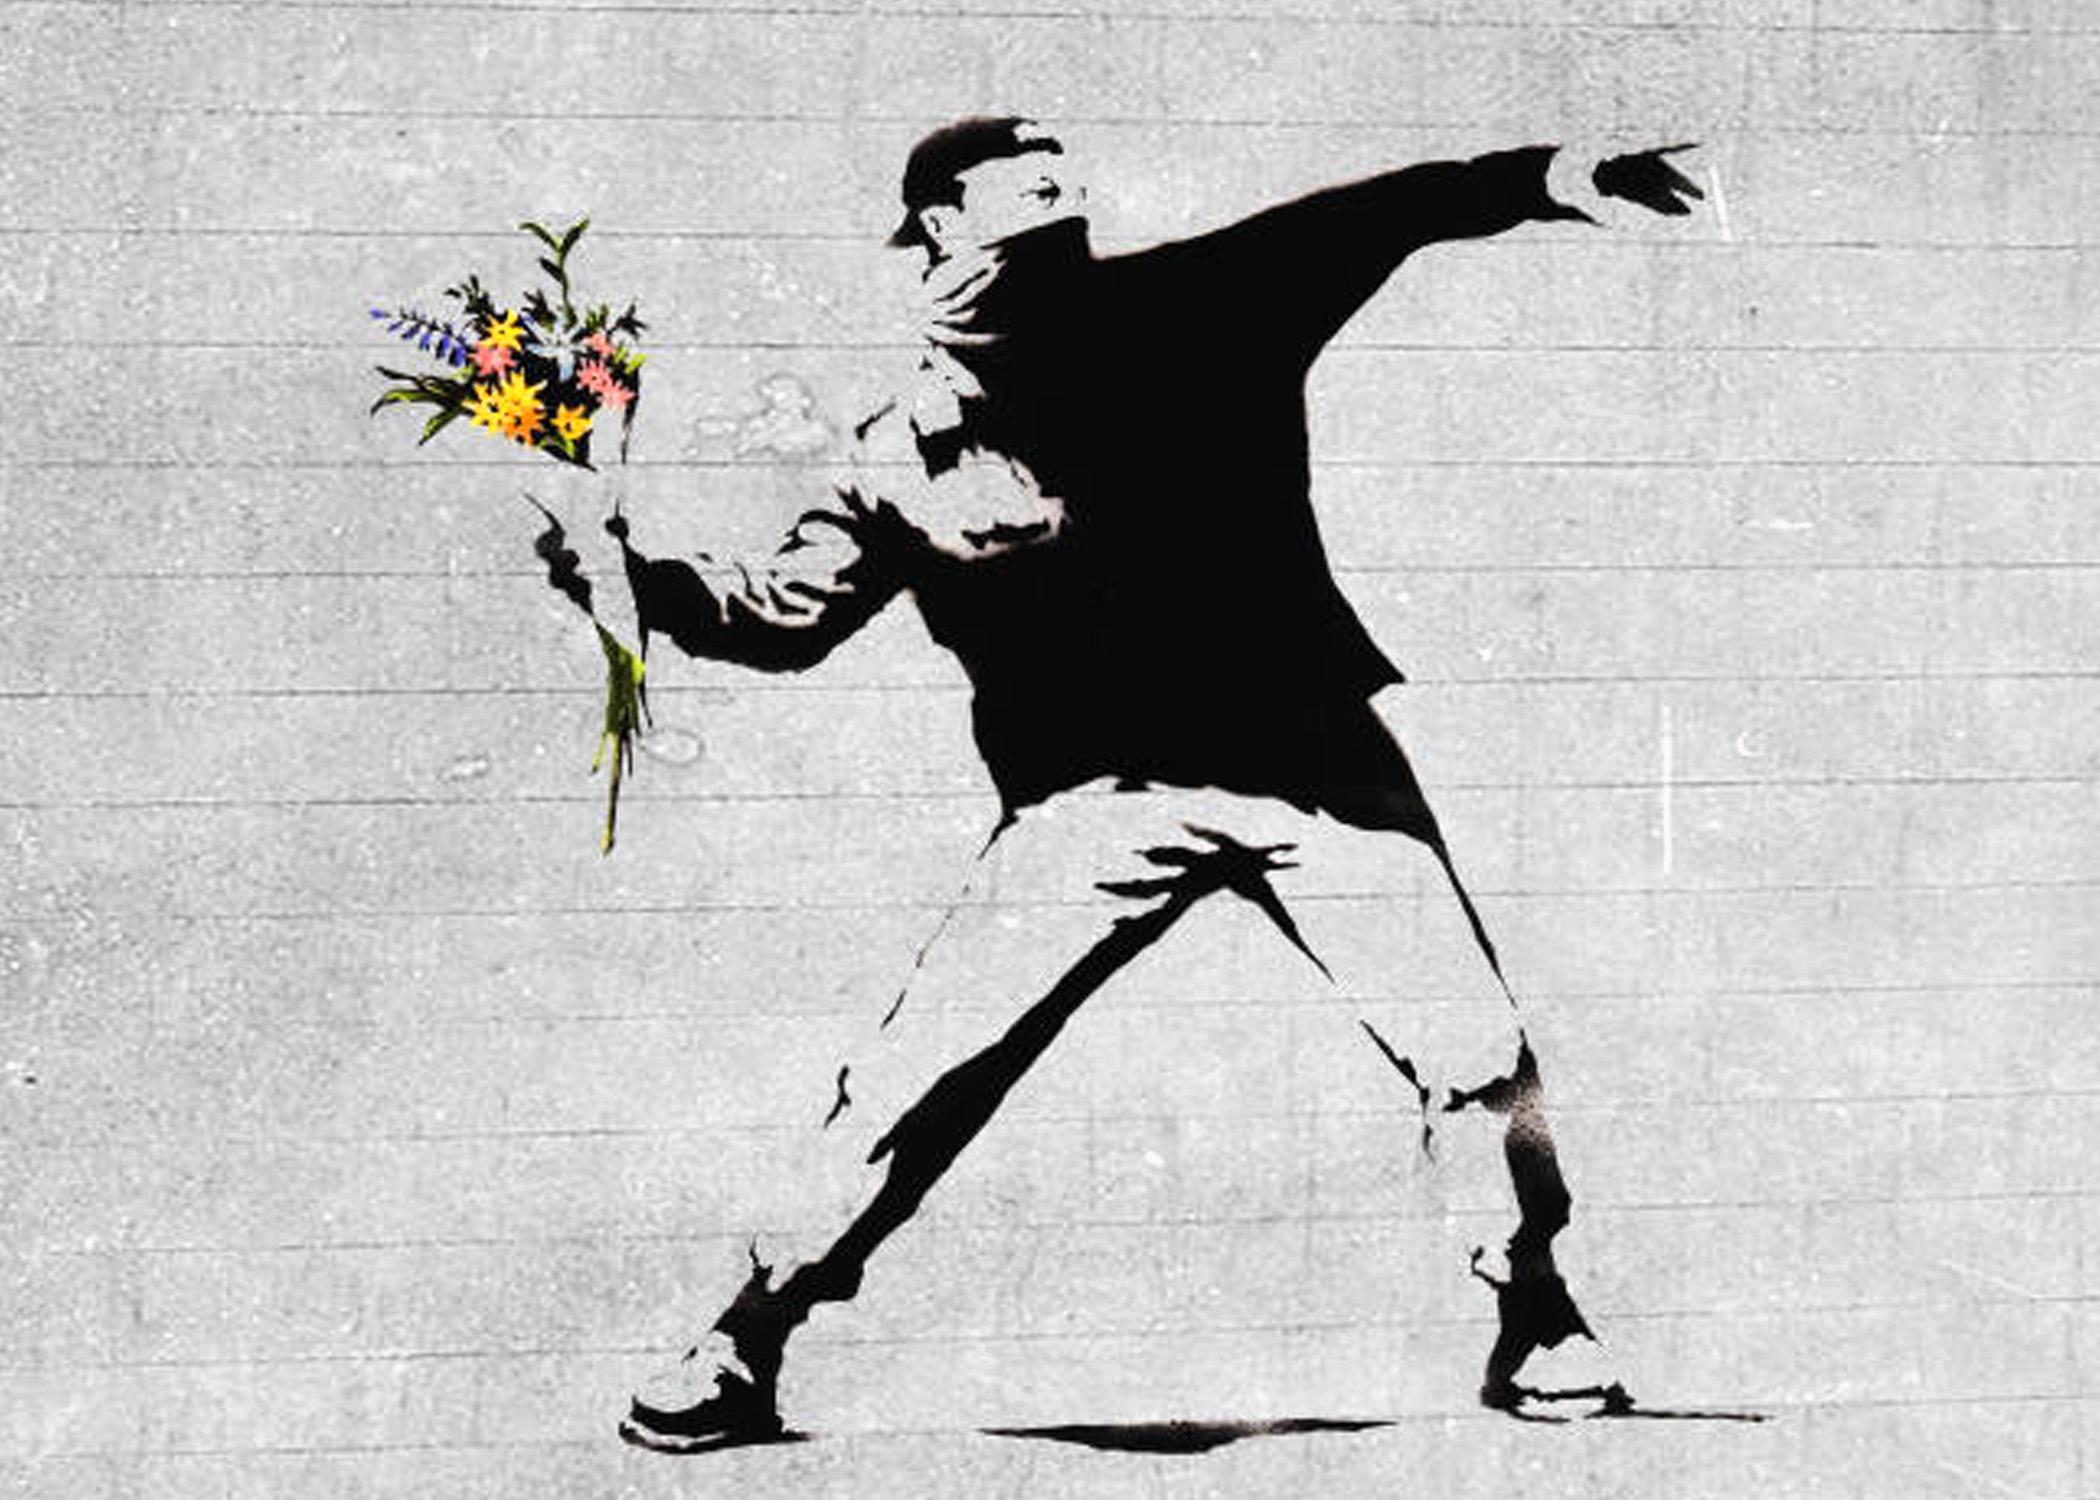 Flower brick thrower_Bansky